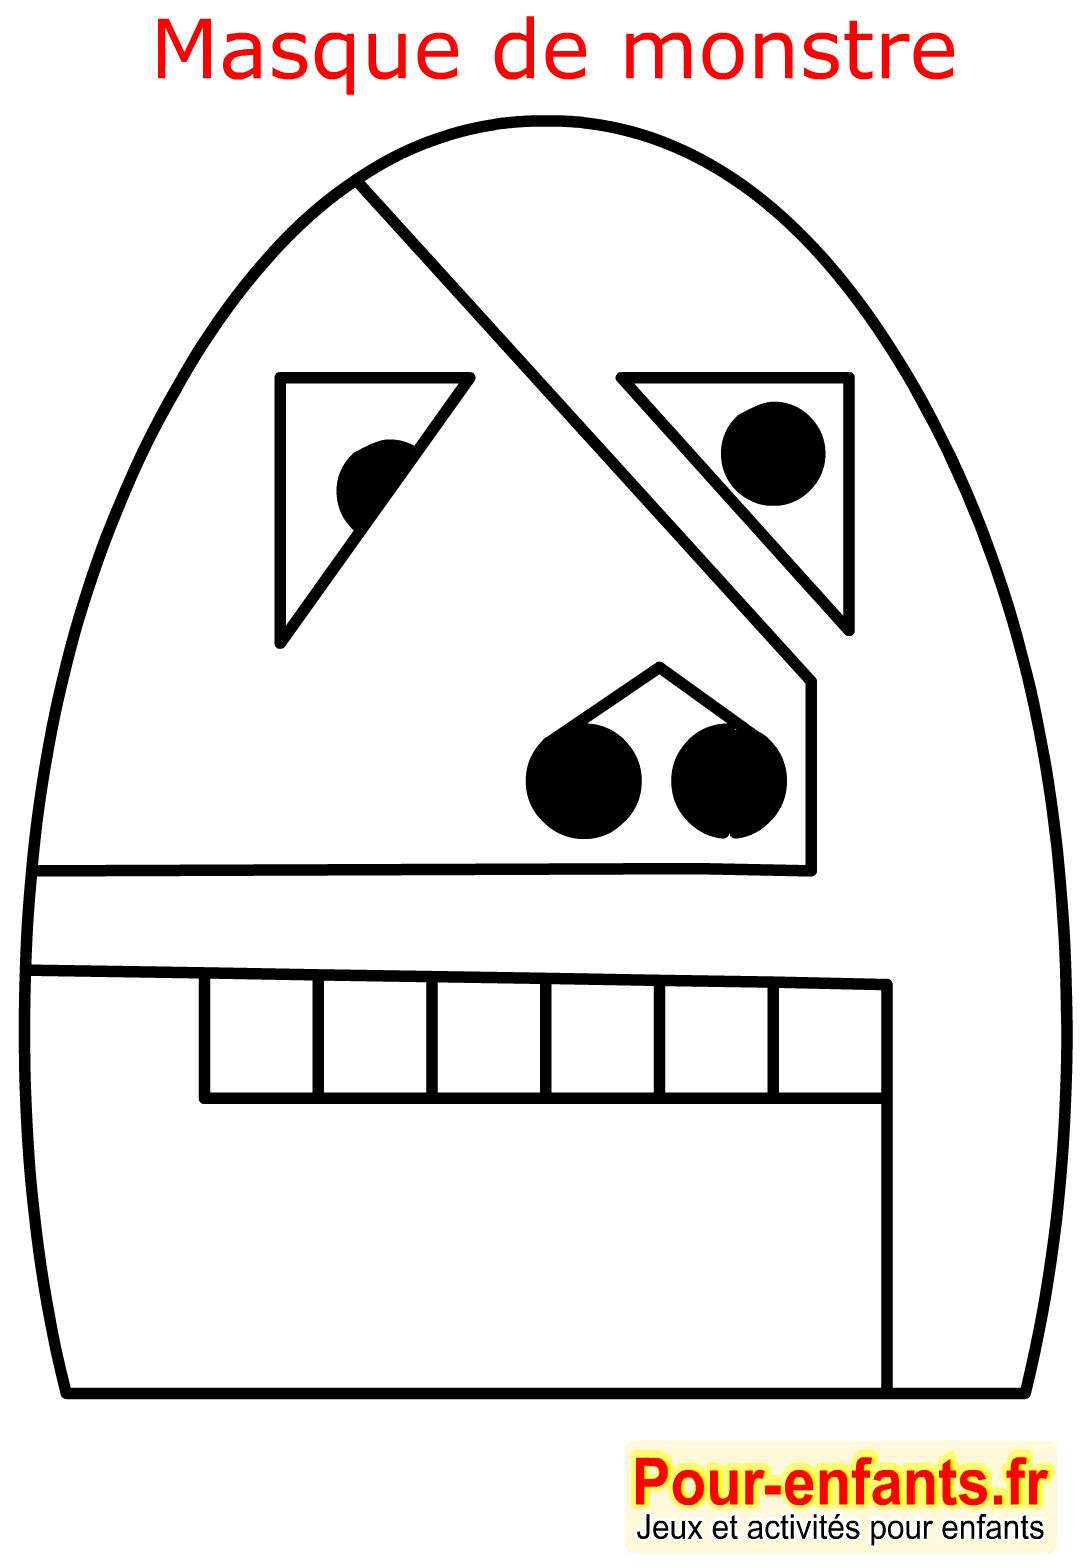 Halloween Coloriage Masque Bébé Monstre Enfant Monstres avec Fabrication Masque Halloween